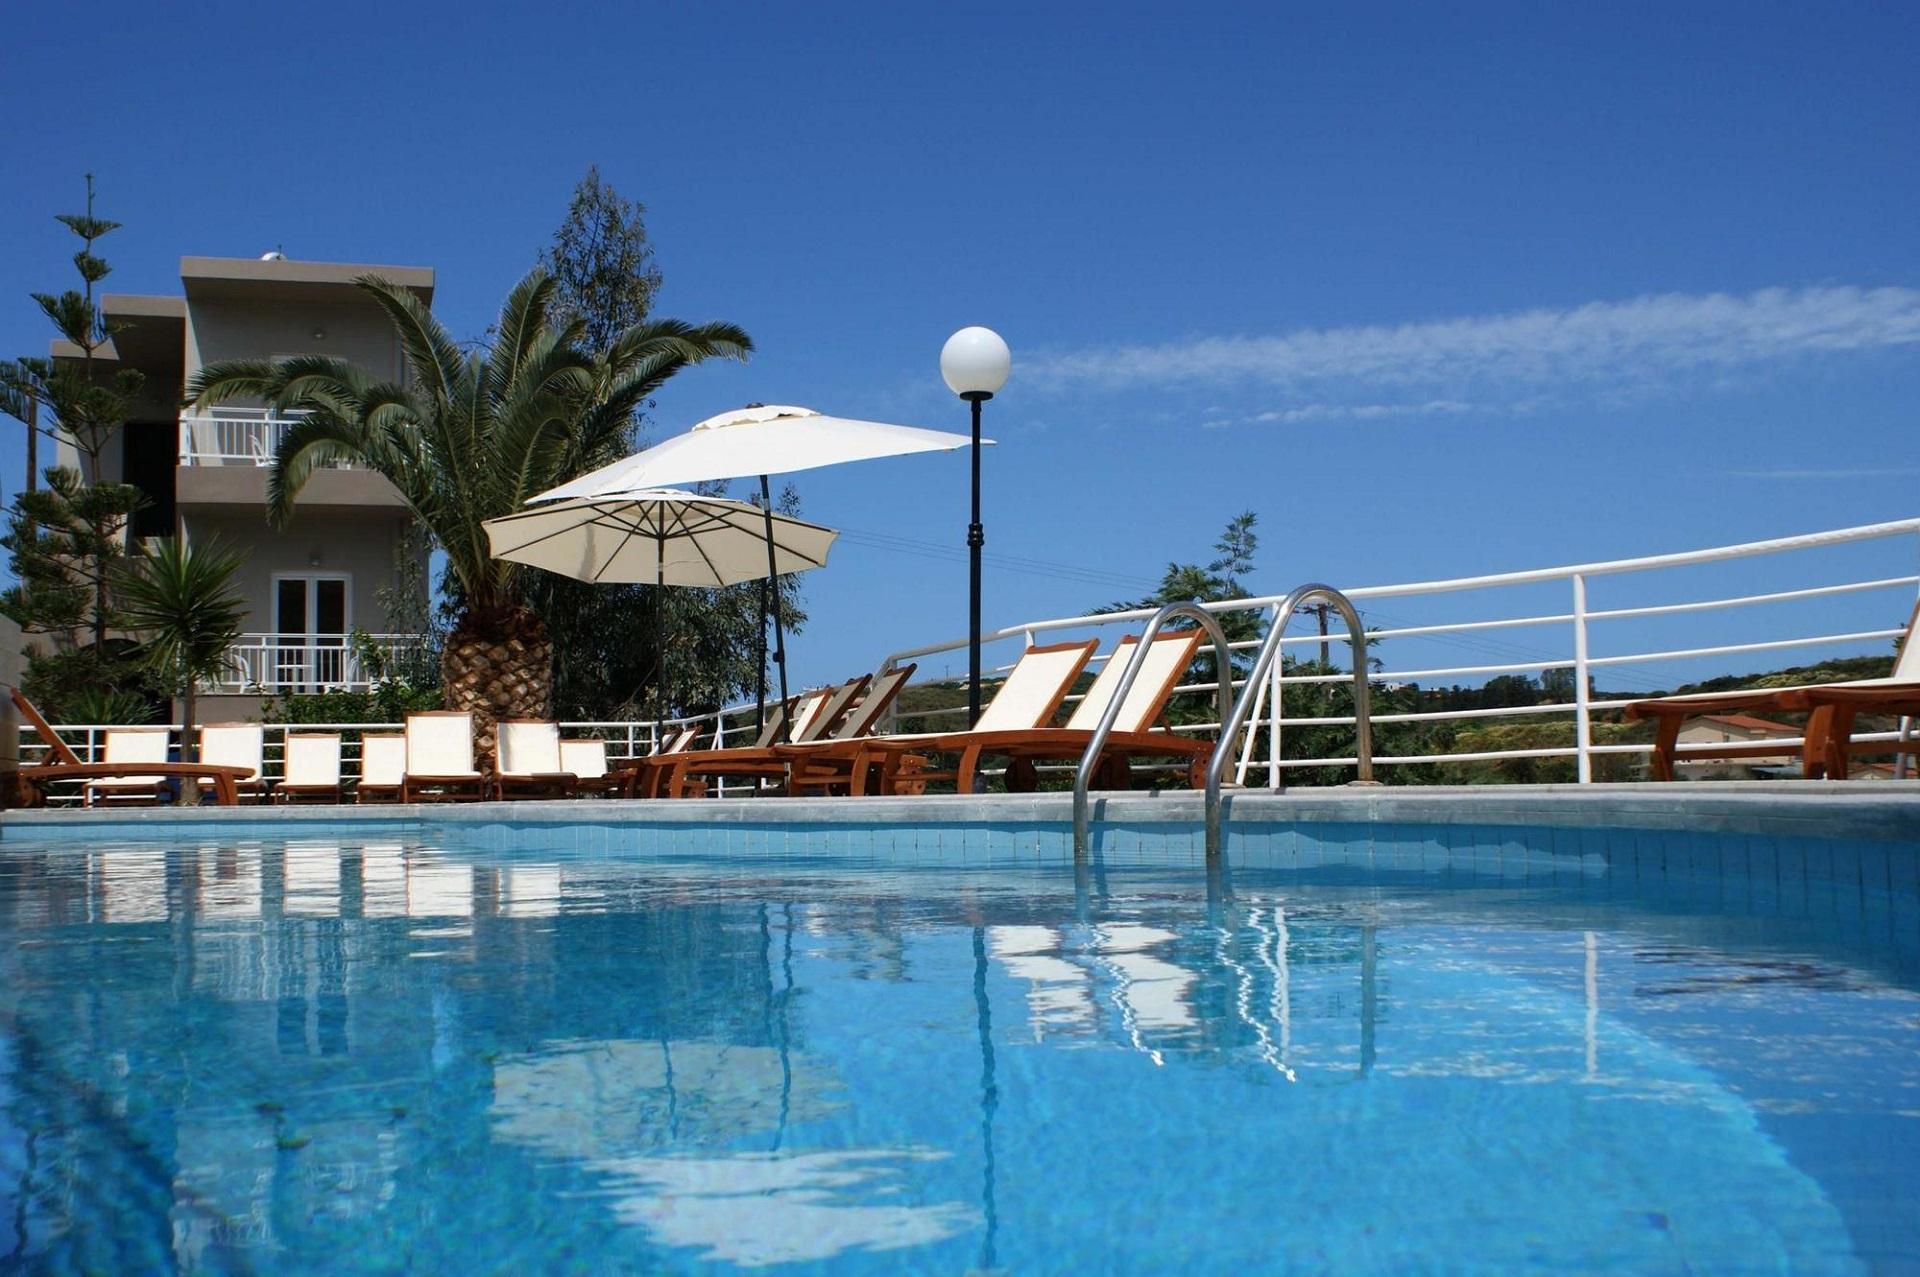 http://www.budavartours.hu/binaries//content/gallery/budavar/locations/accomodations/G%C3%B6r%C3%B6gorsz%C3%A1g/Agia+Pelagia/Pelagia+Bay+Hotel/pelagia-bay-hotel-kreta-gorogorszag-greece-crete-main.jpg